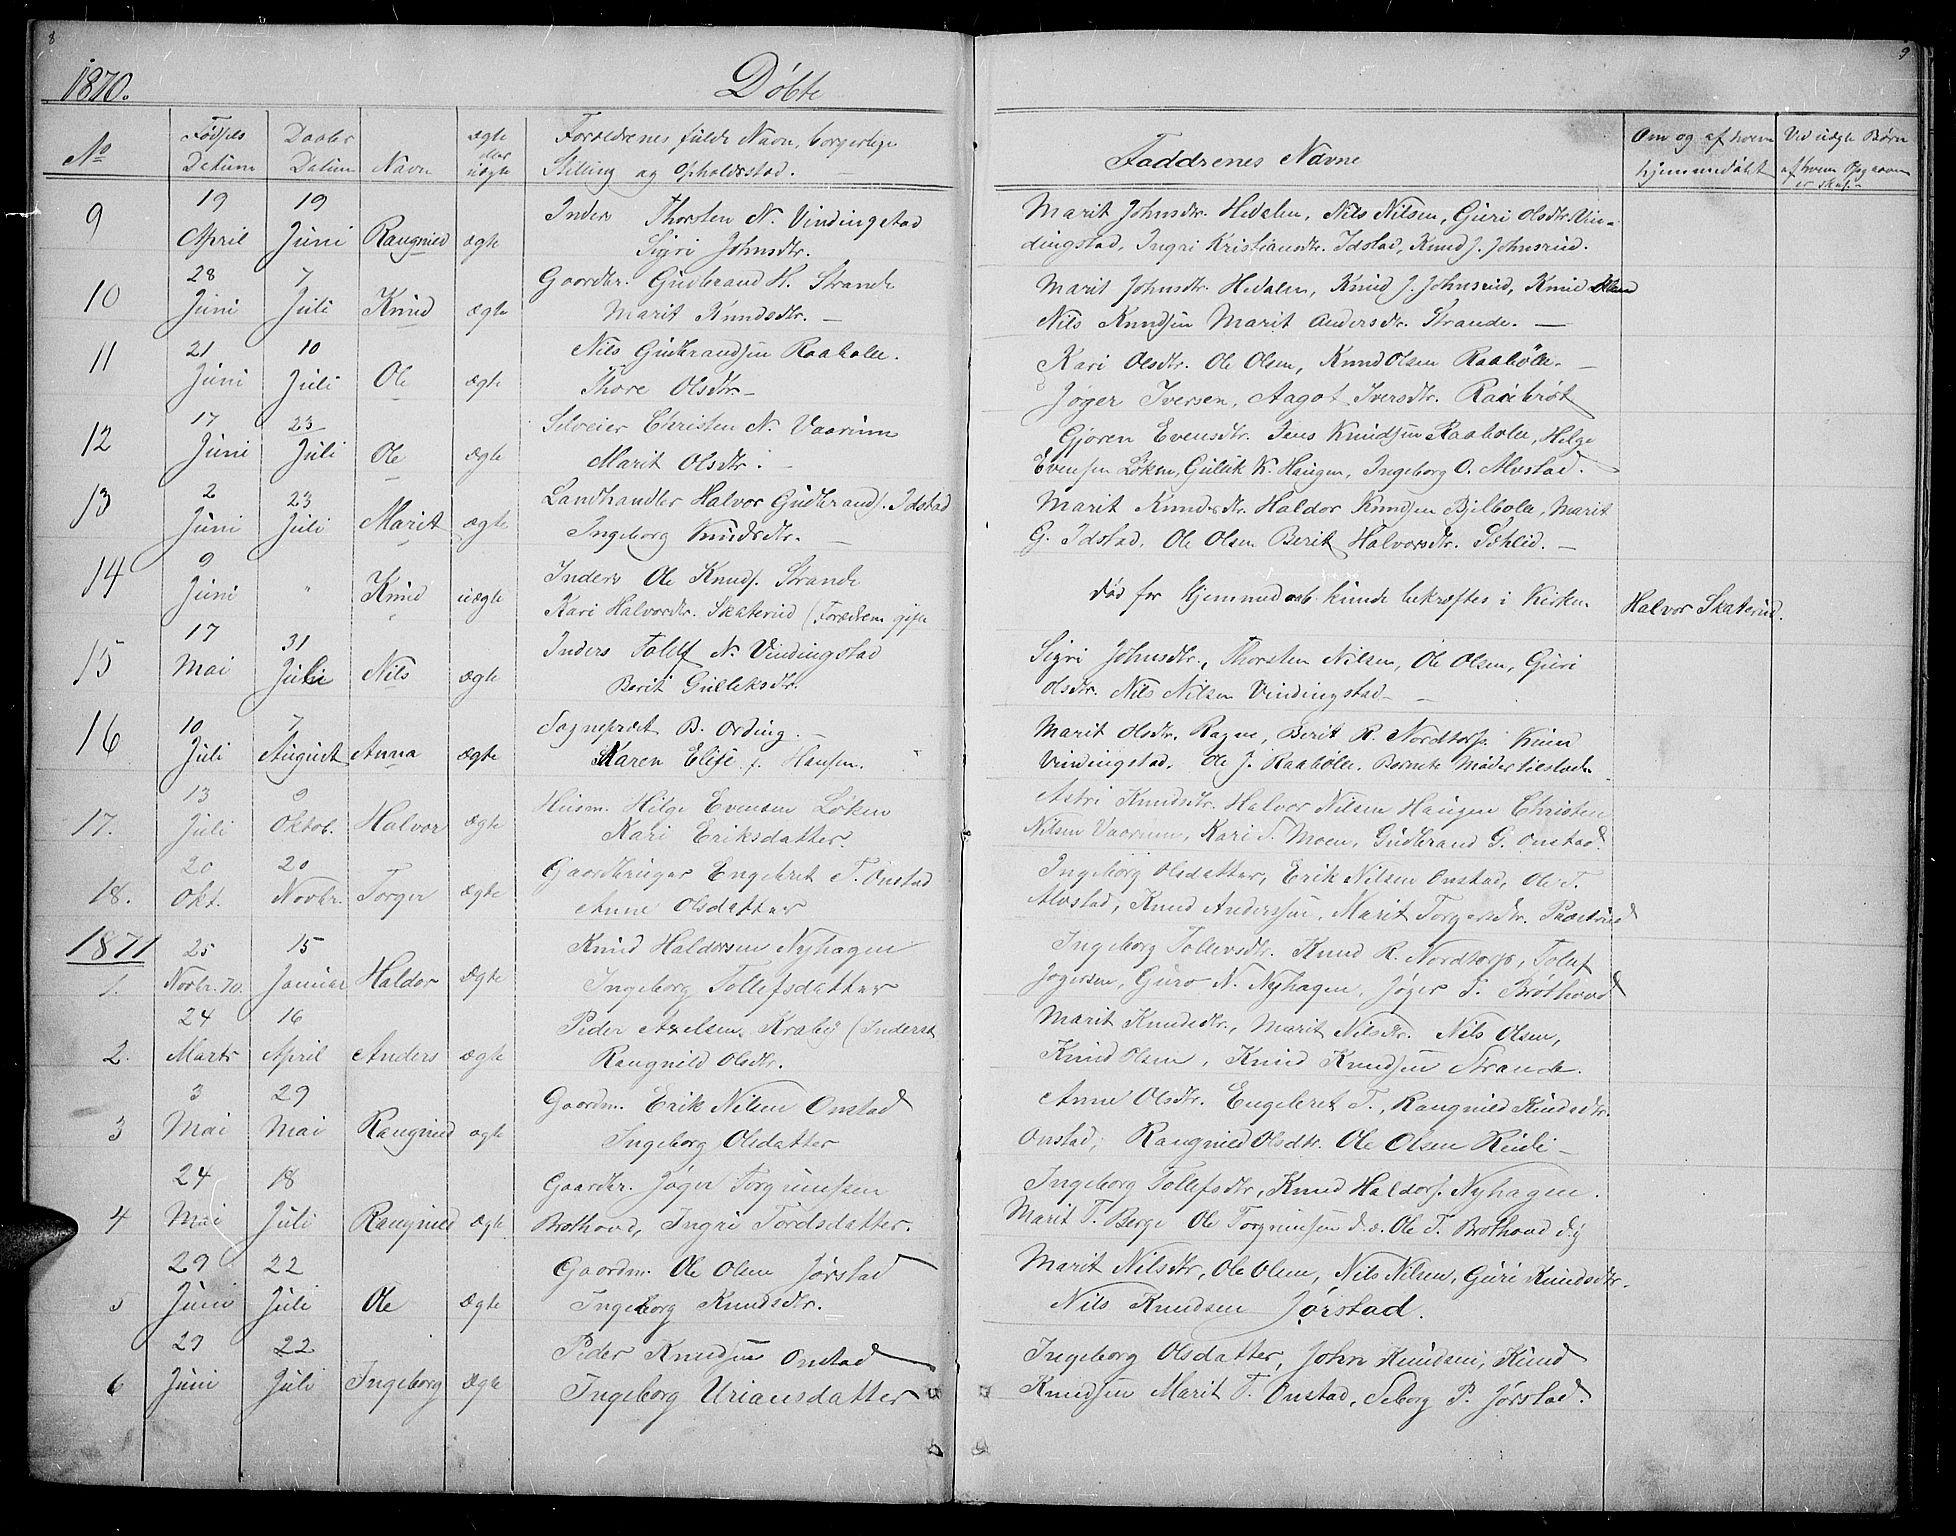 SAH, Øystre Slidre prestekontor, Klokkerbok nr. 2, 1866-1886, s. 8-9